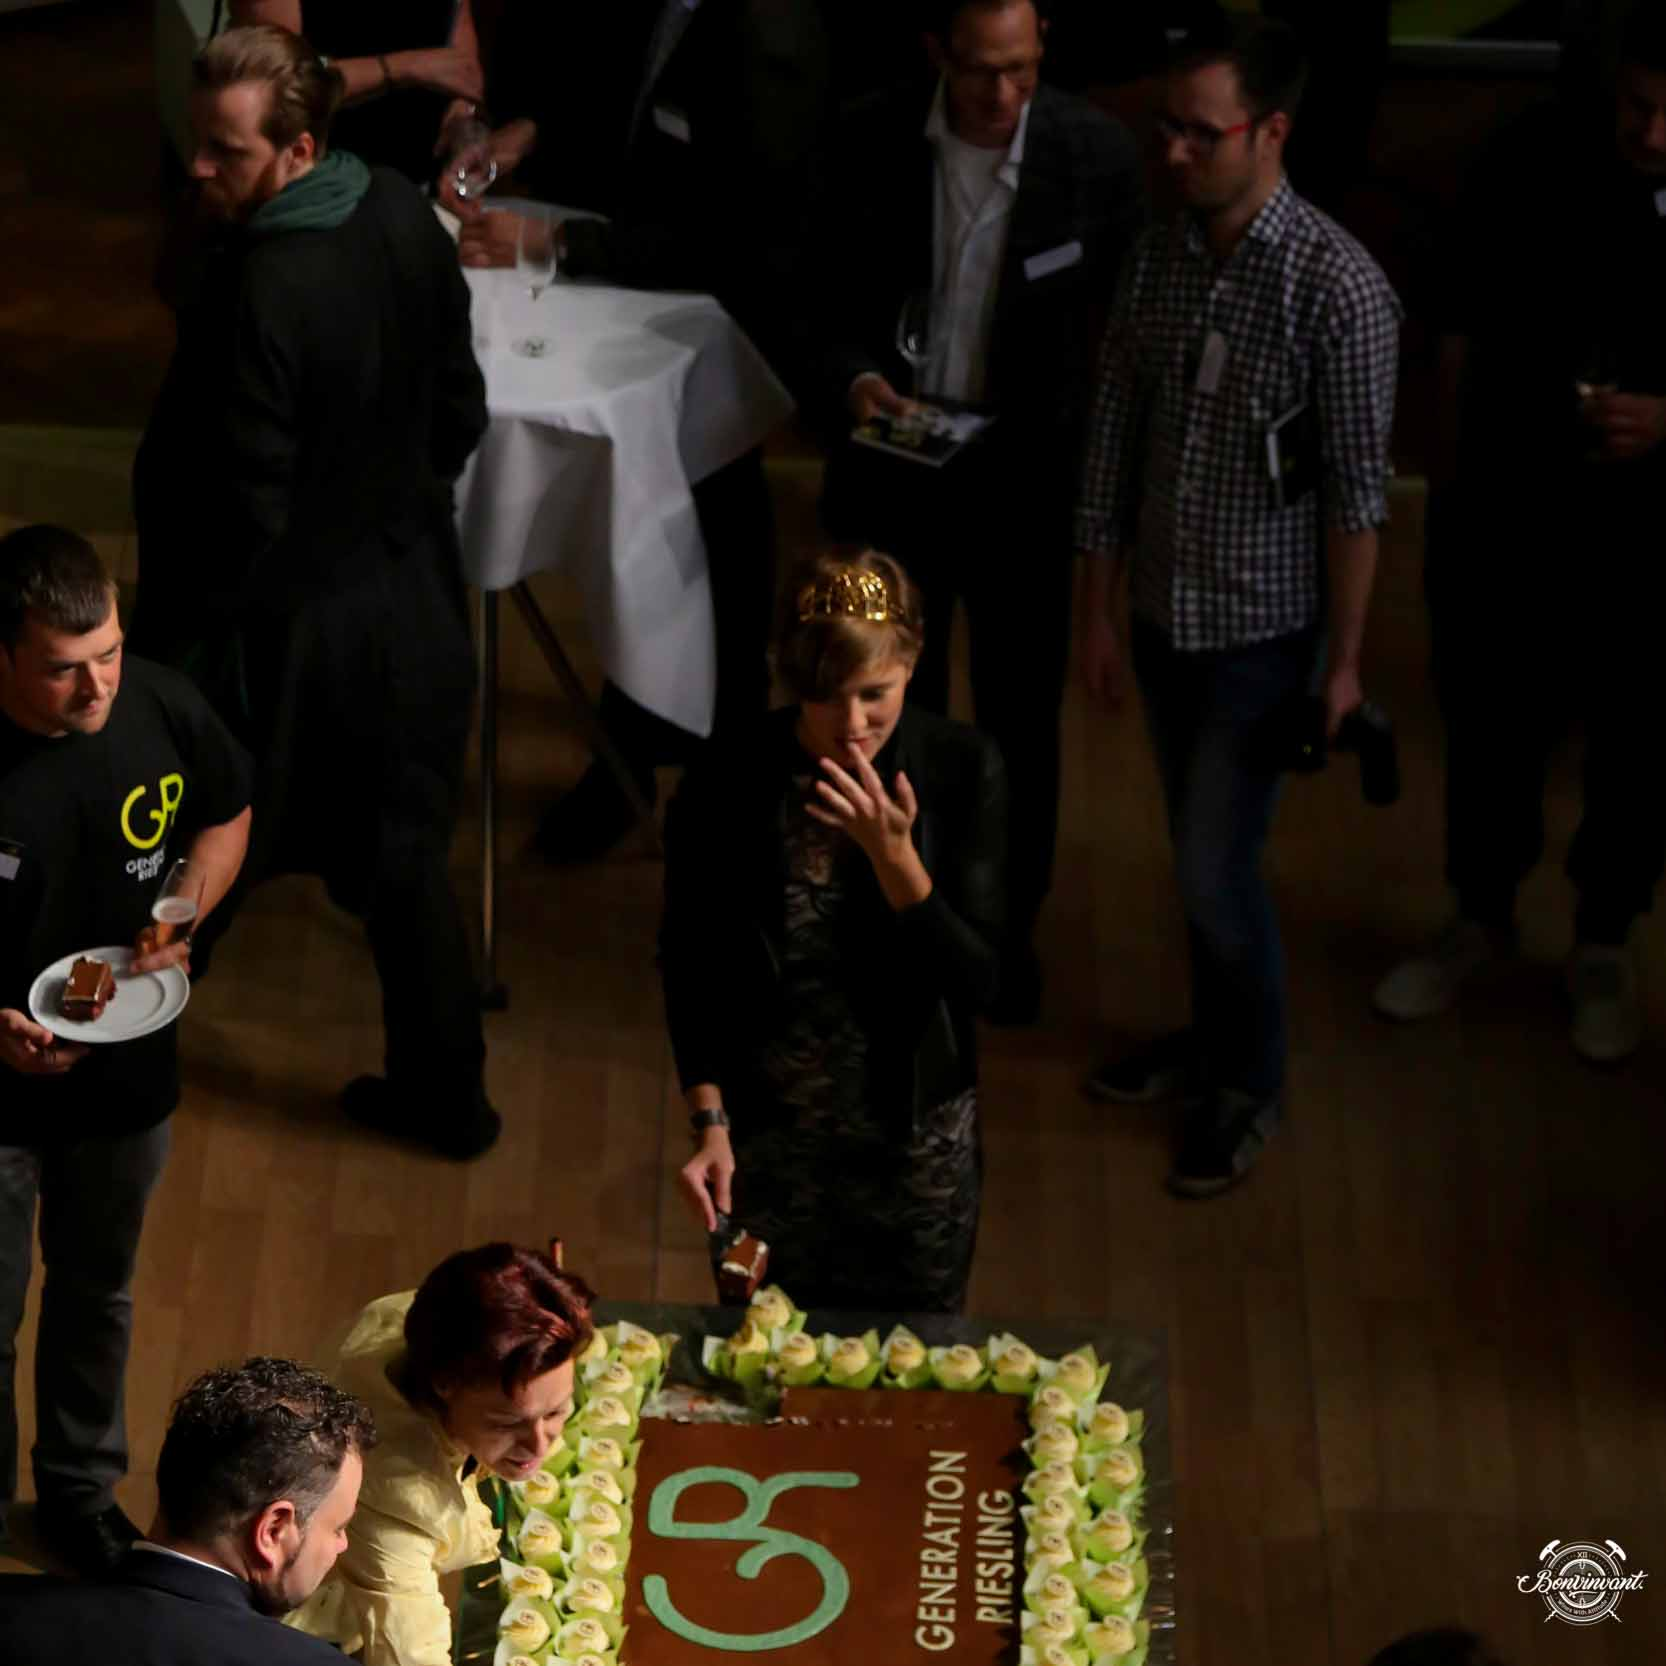 160613_Josefine_Schlumberger_Generation-Riesling-Torte